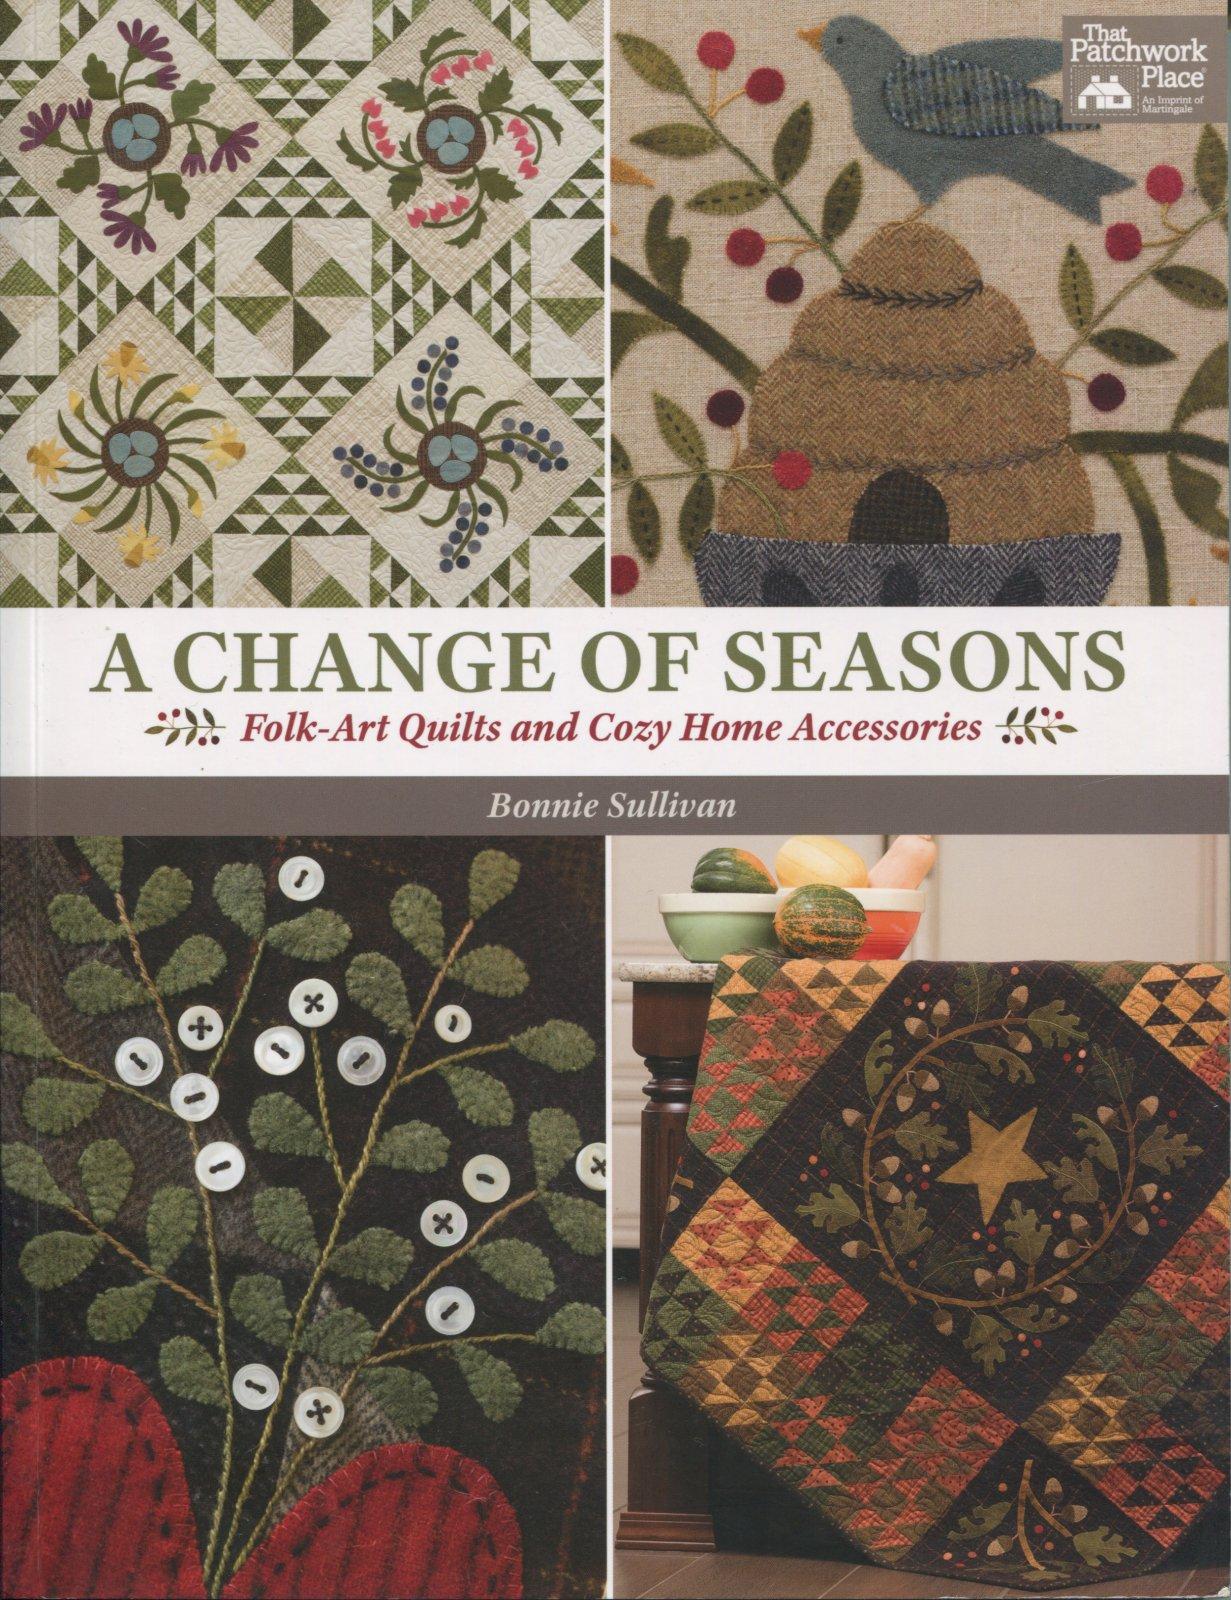 A Change of Seasons Book by Bonnie Sullivan